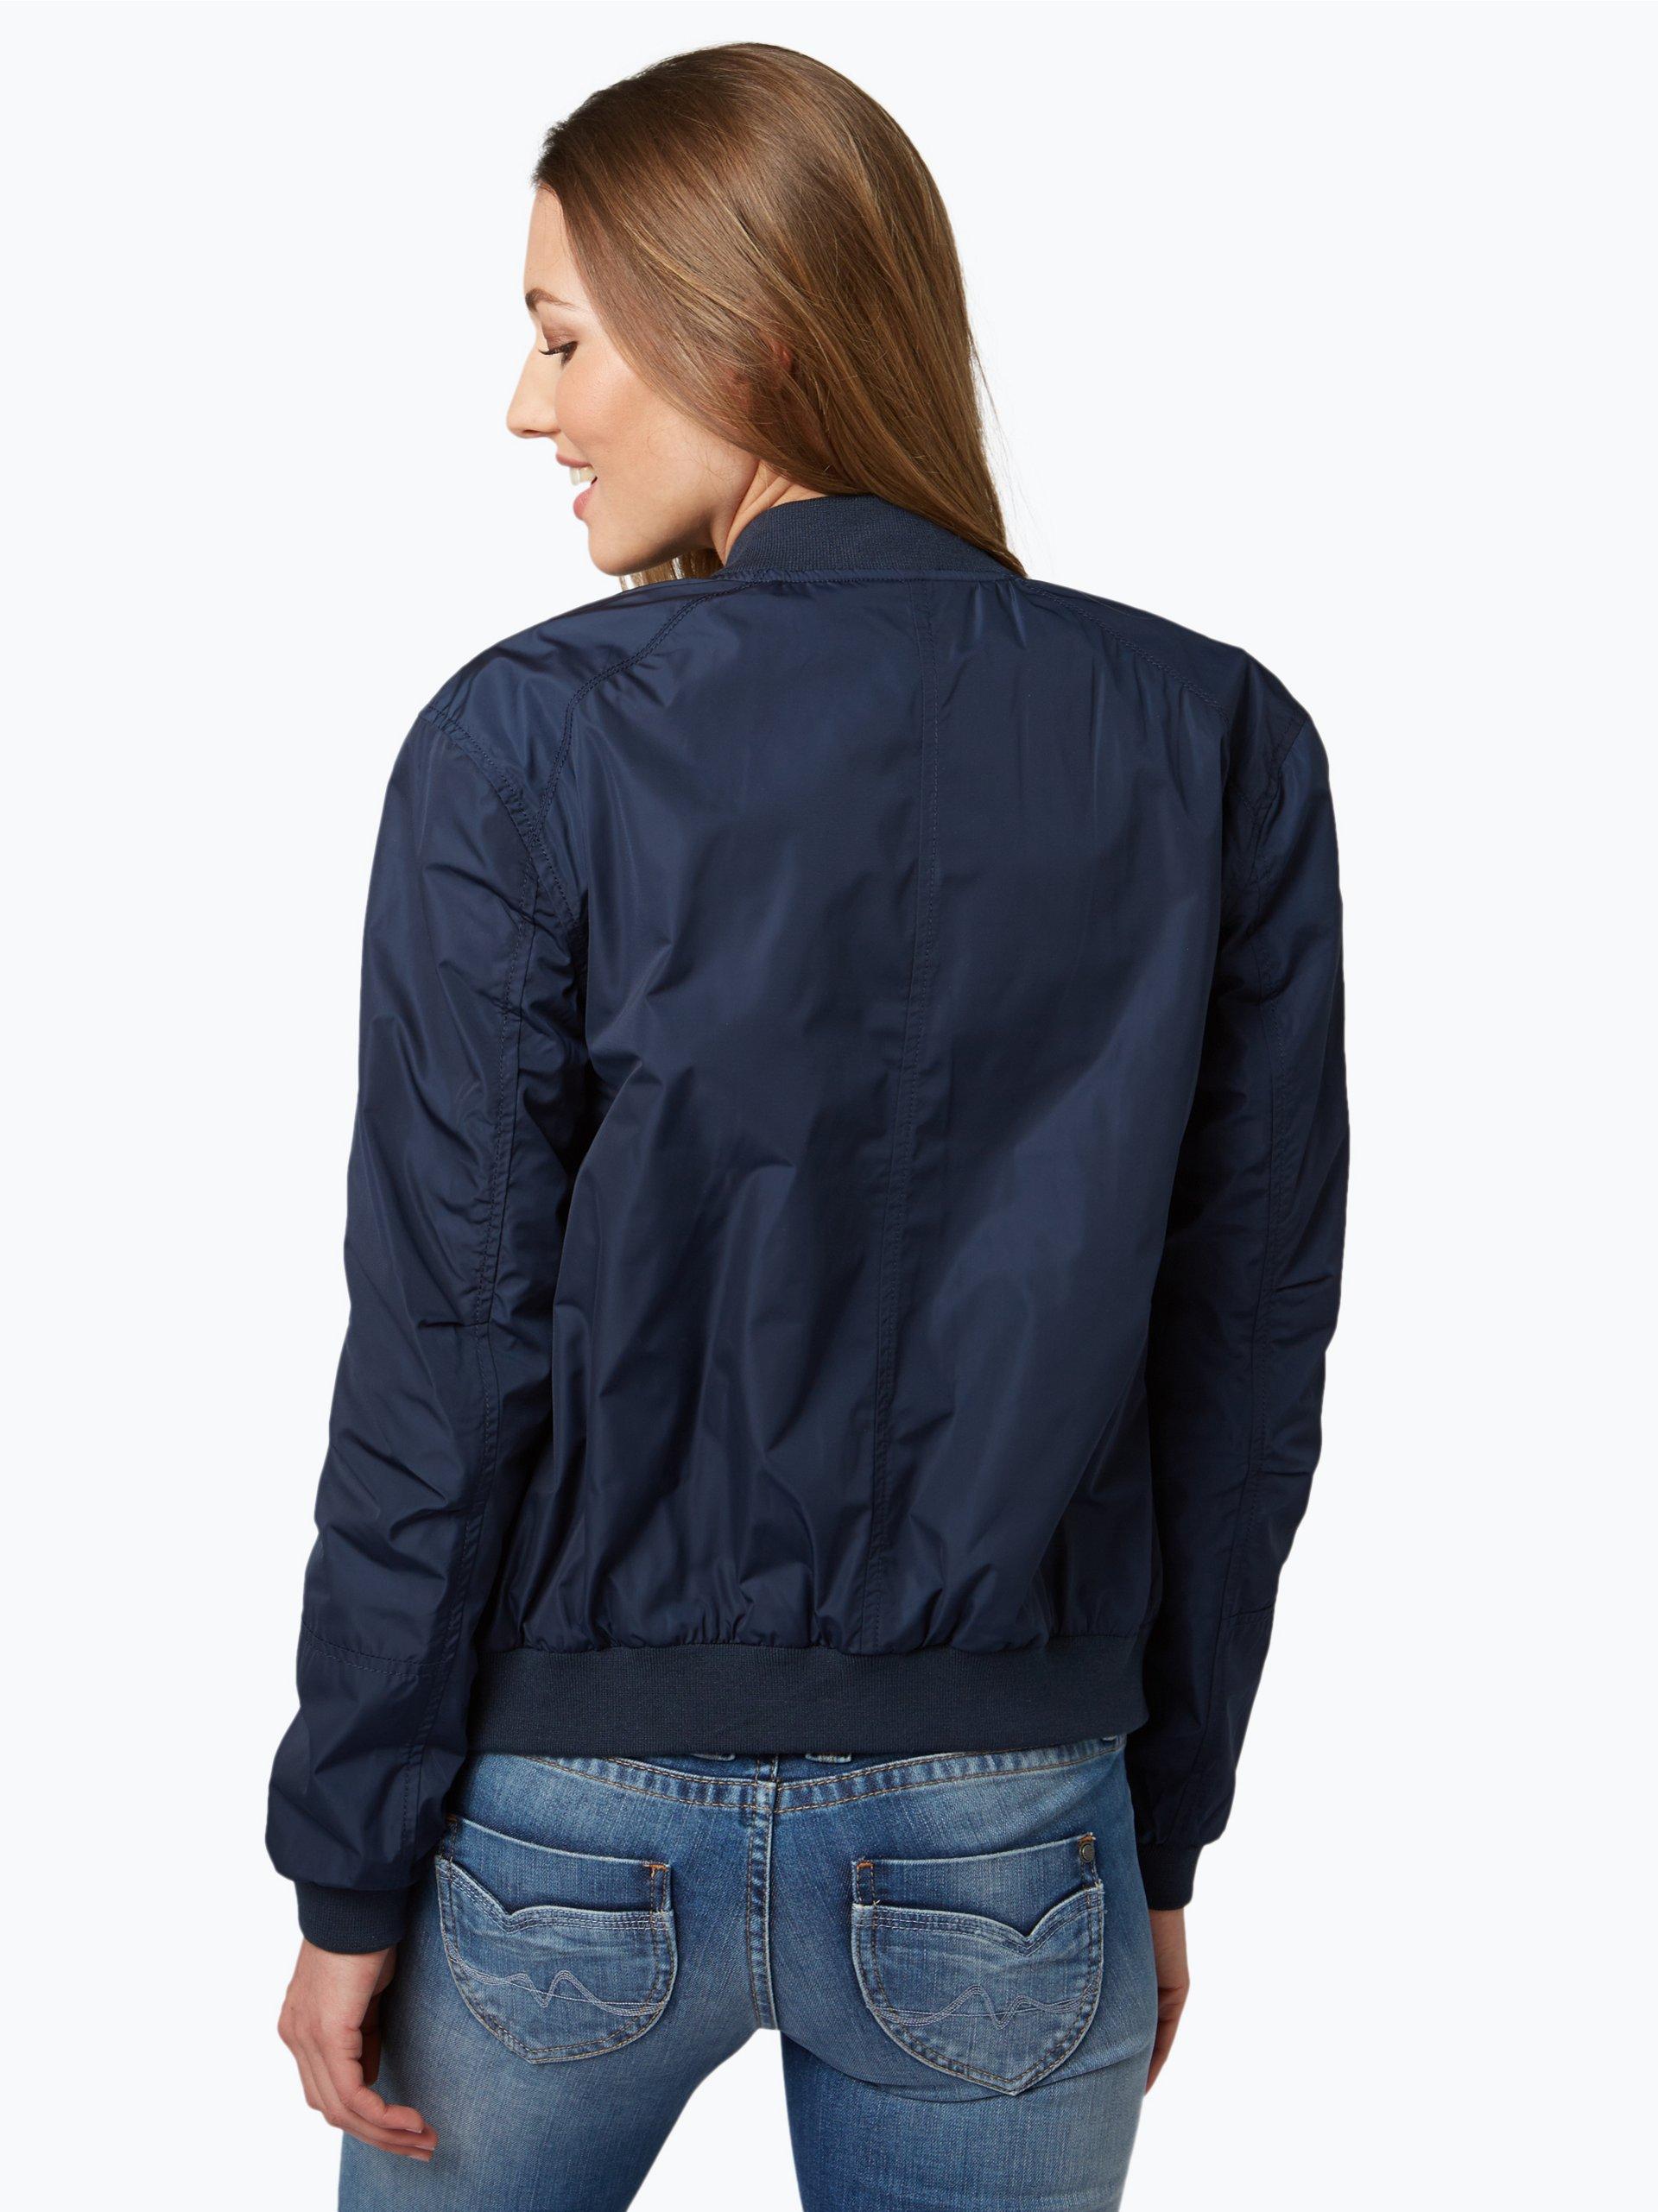 tommy jeans damen jacke marine uni online kaufen peek. Black Bedroom Furniture Sets. Home Design Ideas